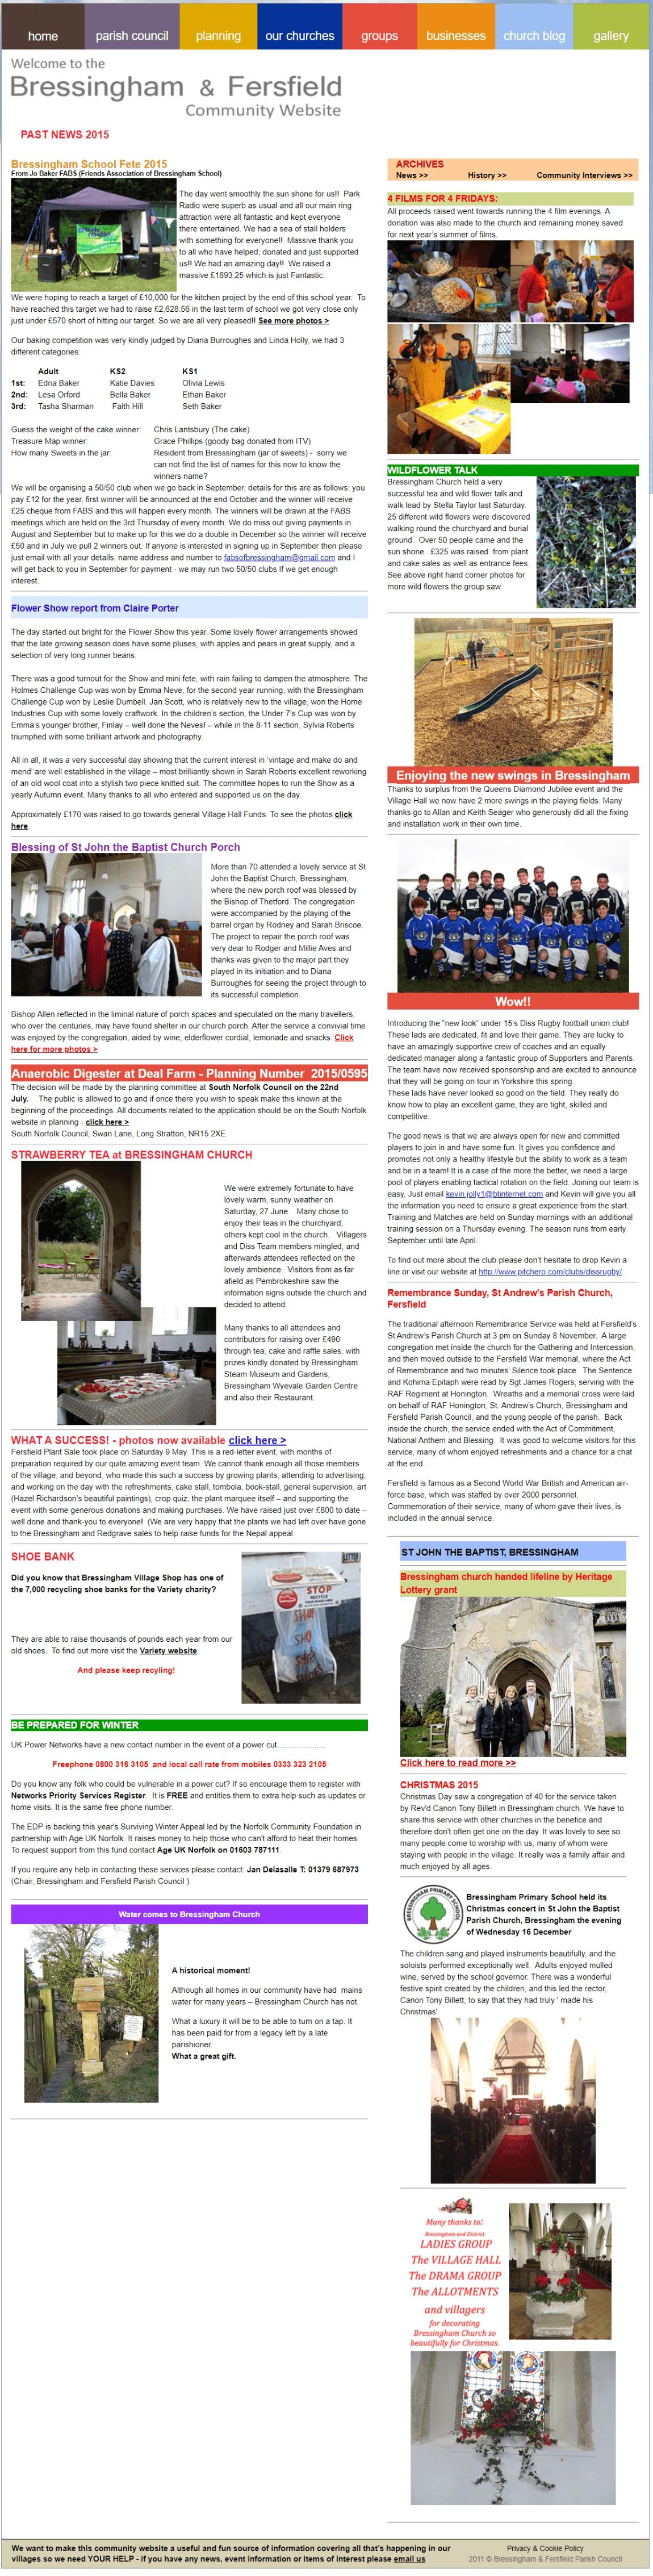 Past News 2015 - New Swings